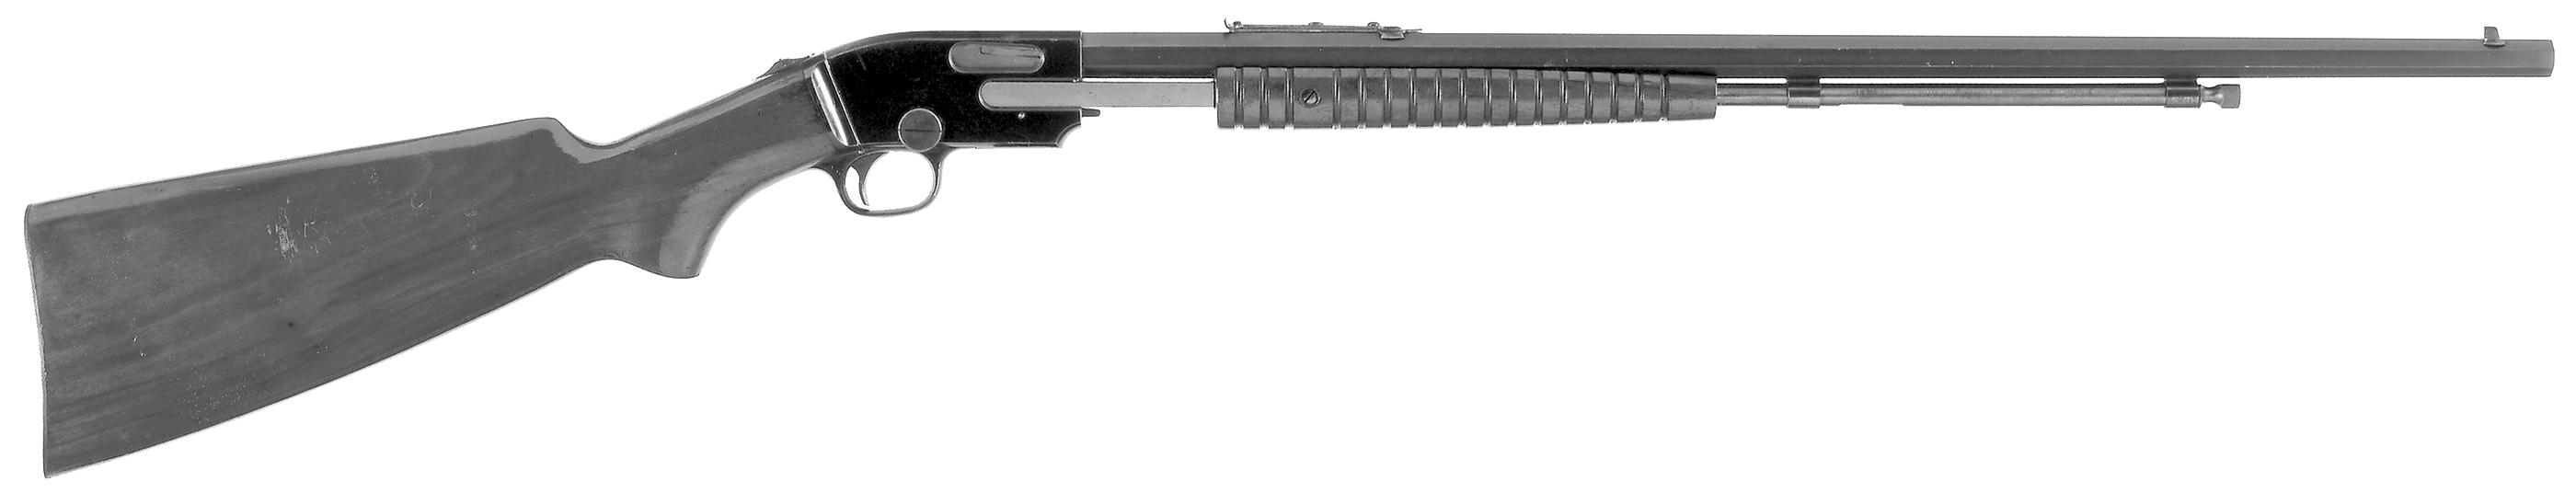 Model 25